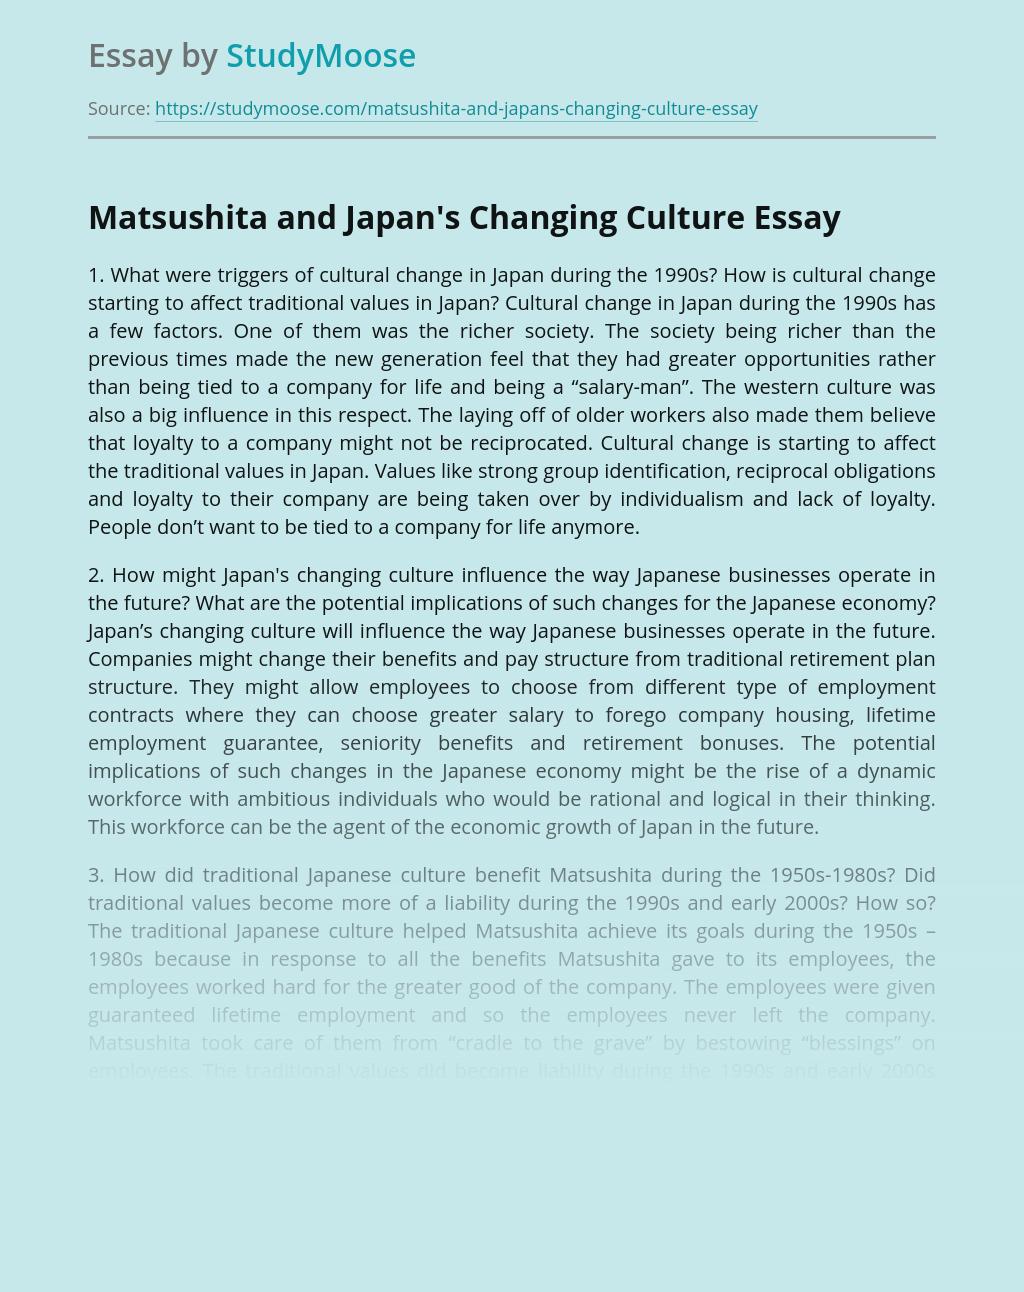 Matsushita and Japan's Changing Culture